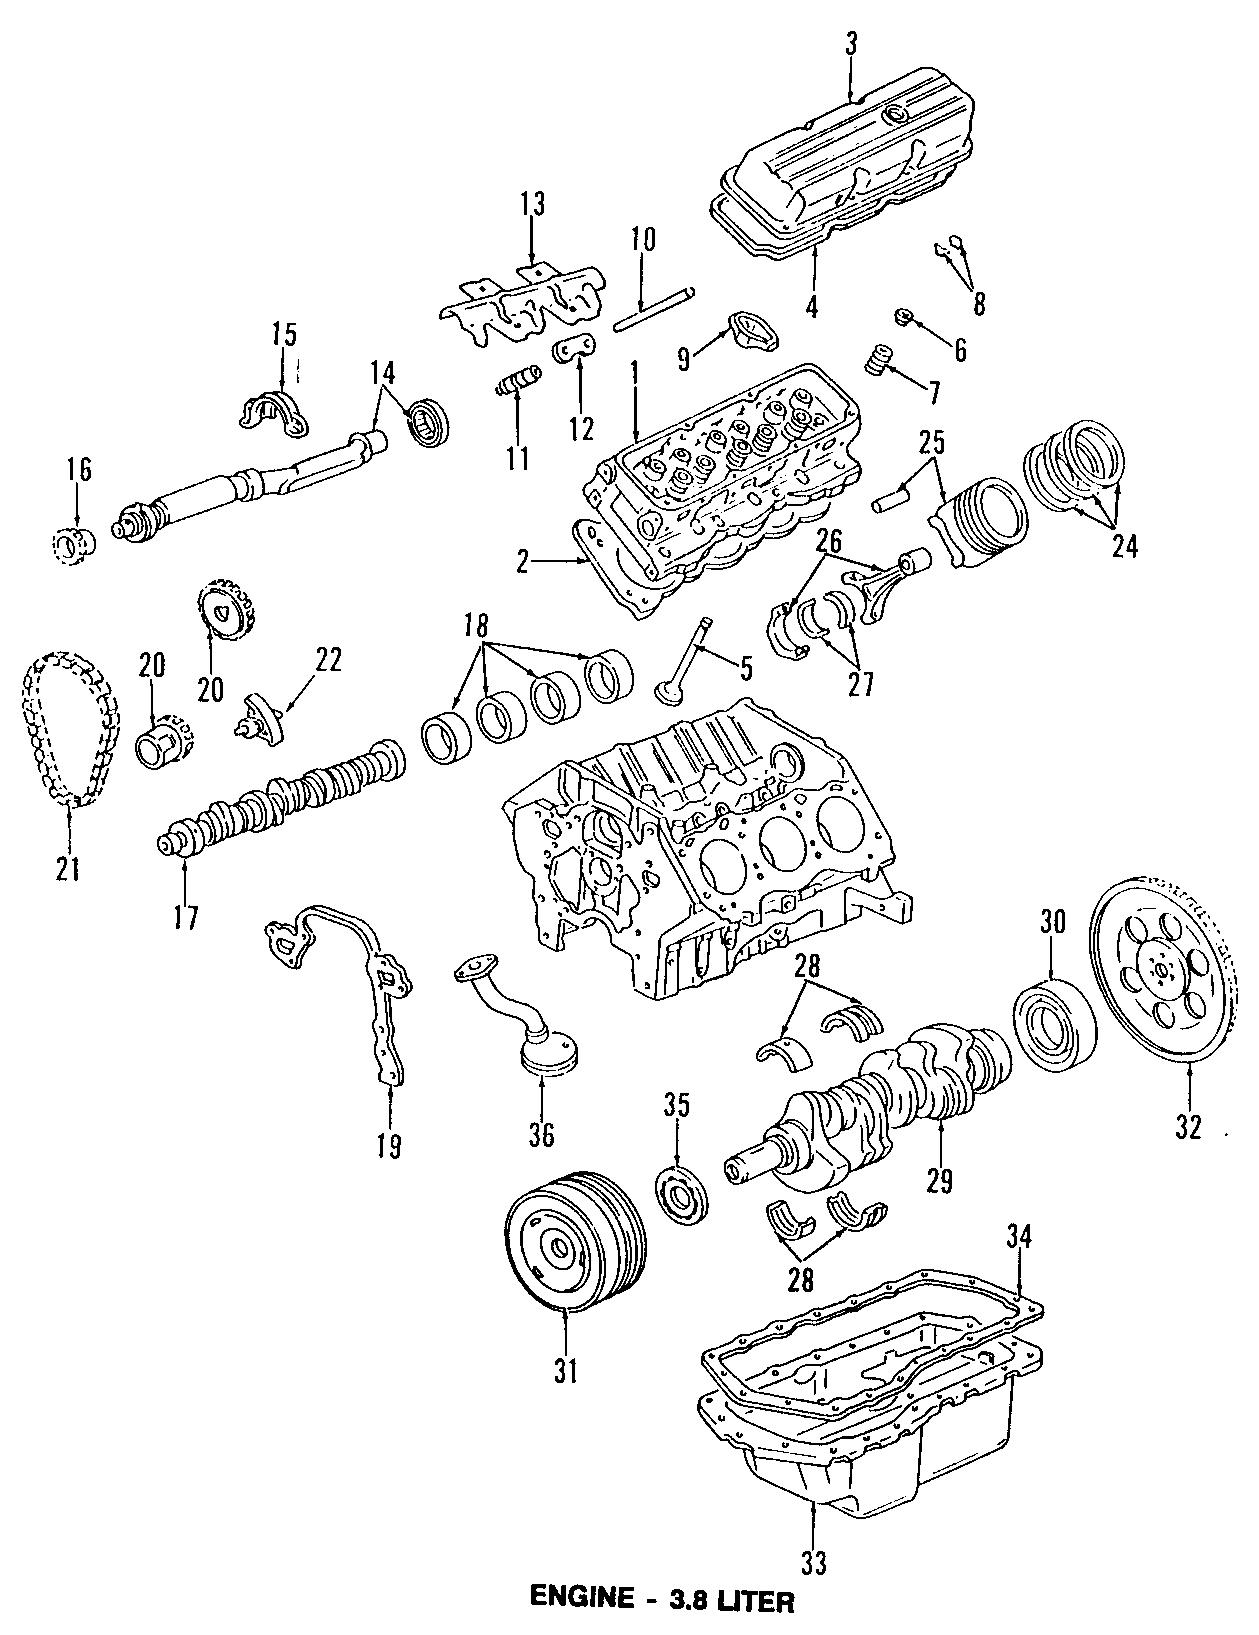 Buick Riviera Engine Push Rod. Models, BEARINGS, CYLINDER